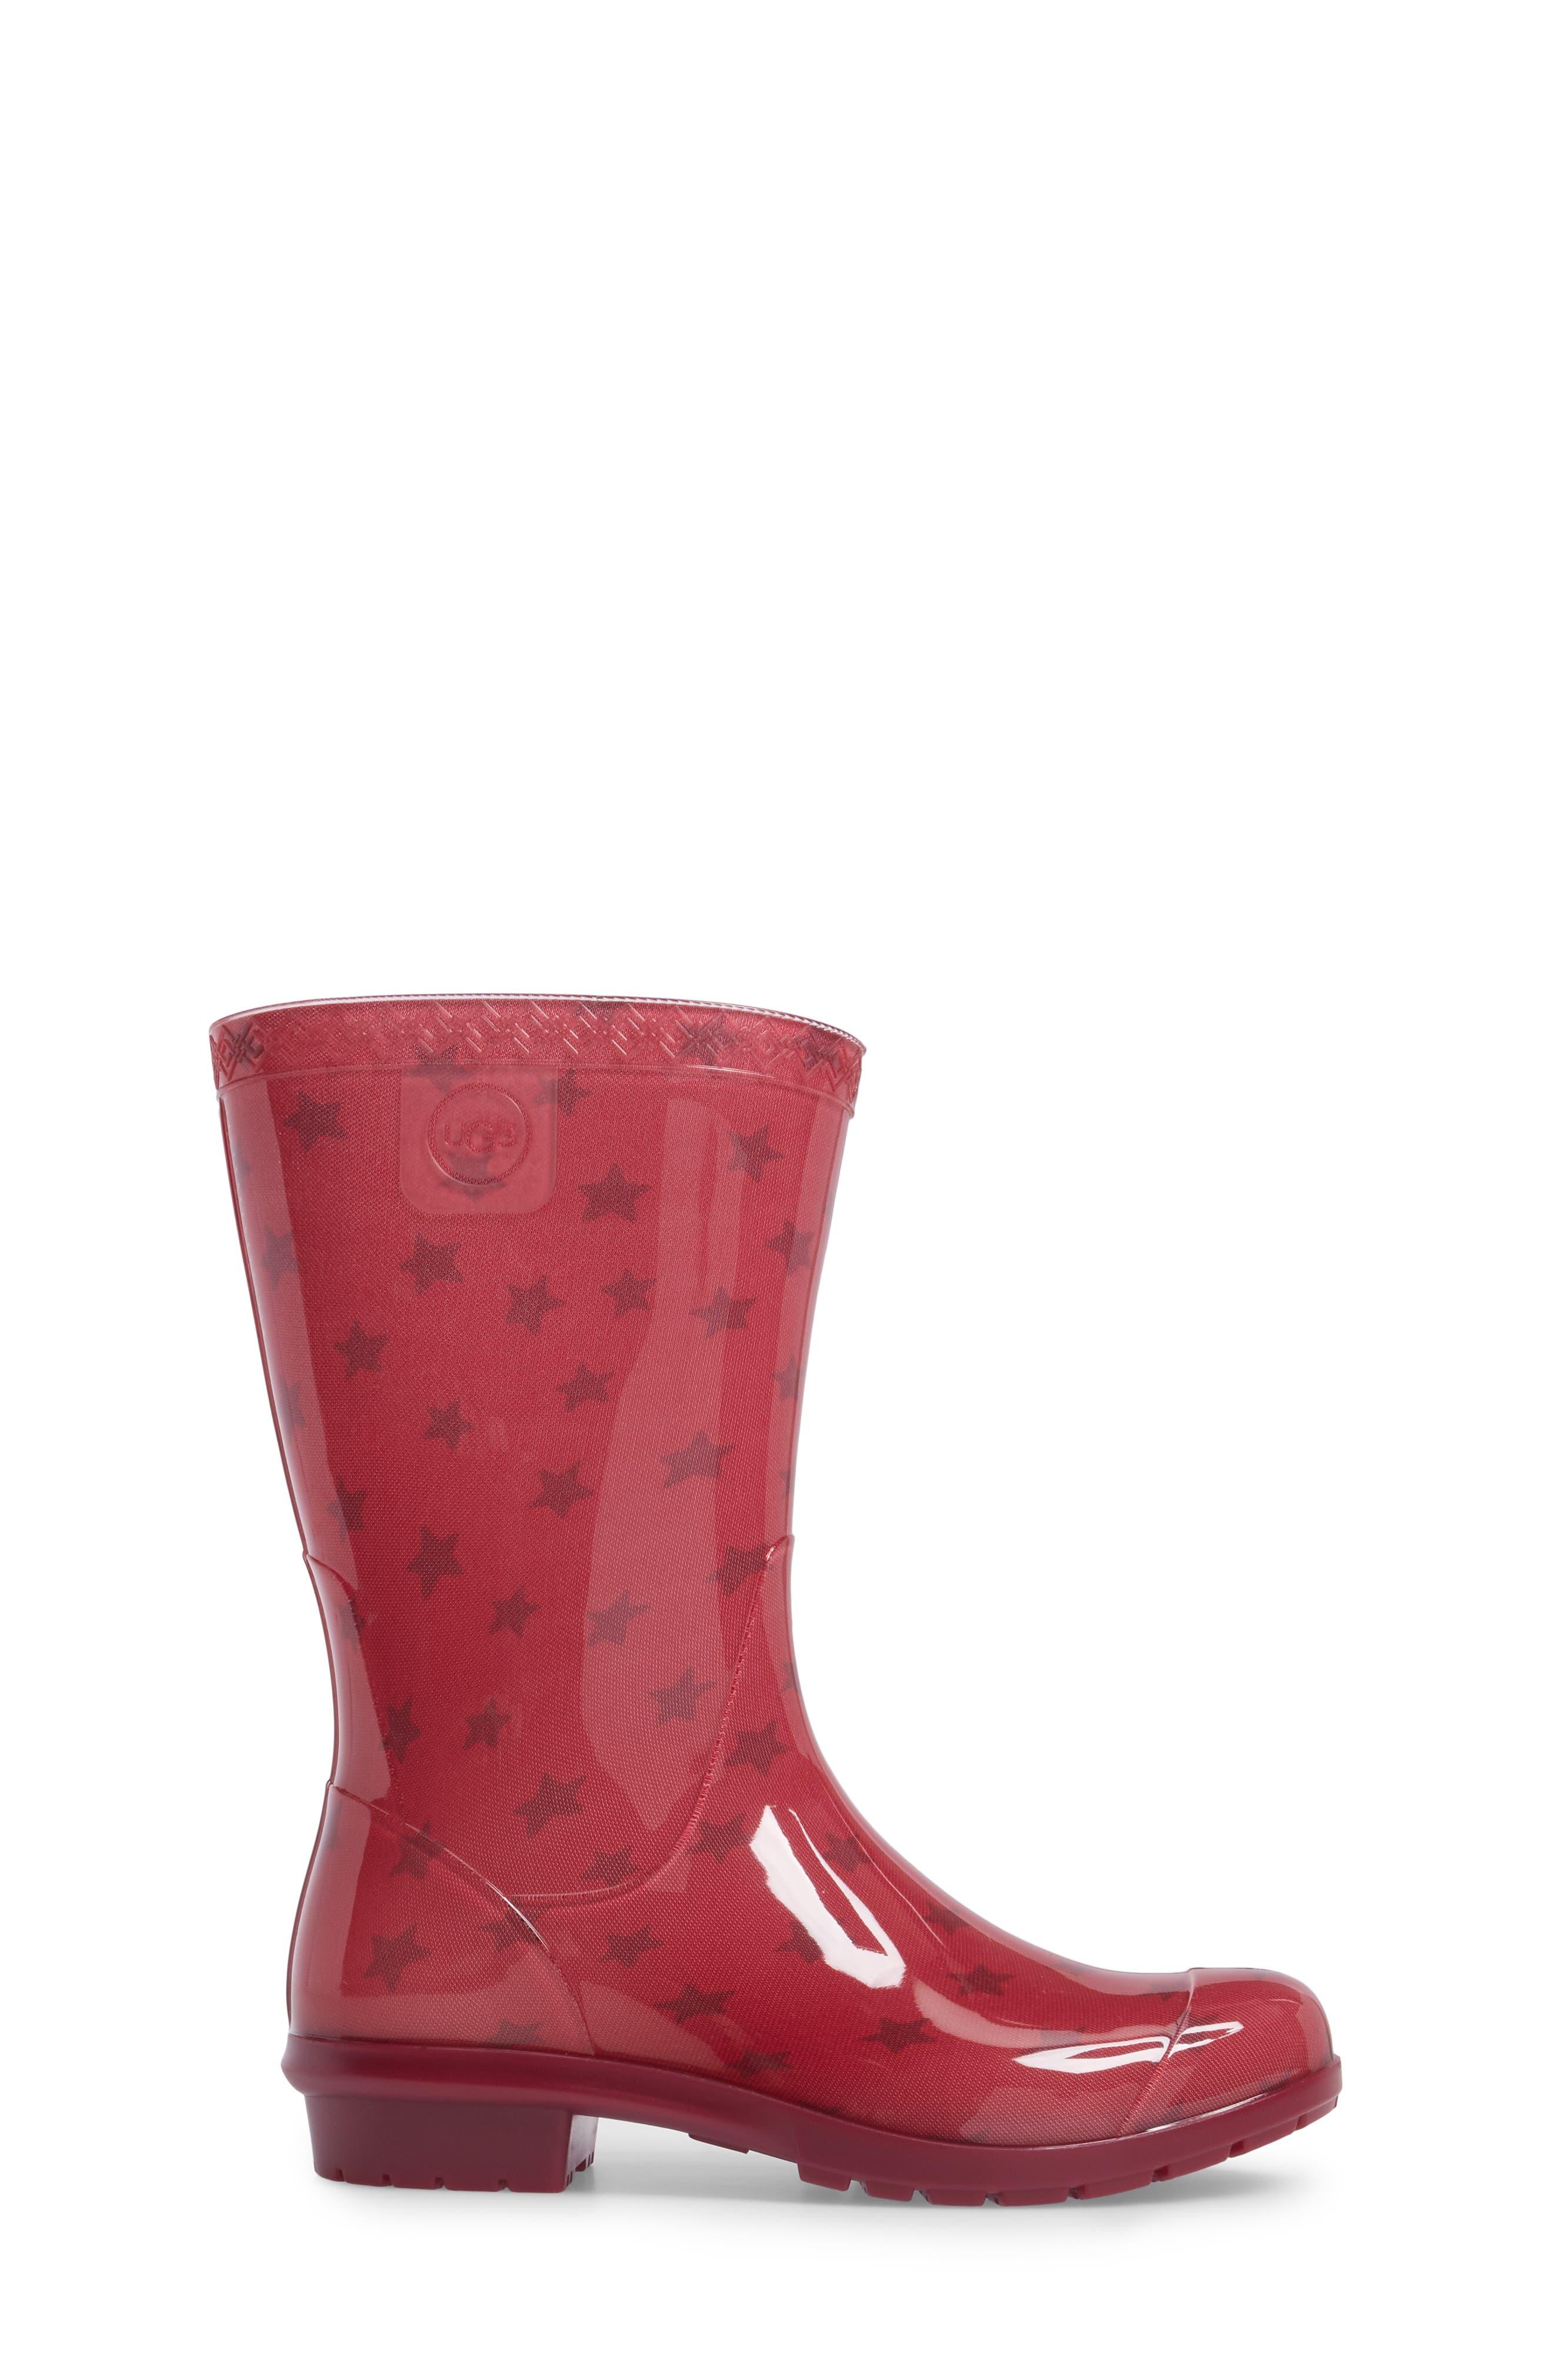 Alternate Image 3  - UGG® Raana Stars Waterproof Rain Boot (Little Kid & Big Kid)